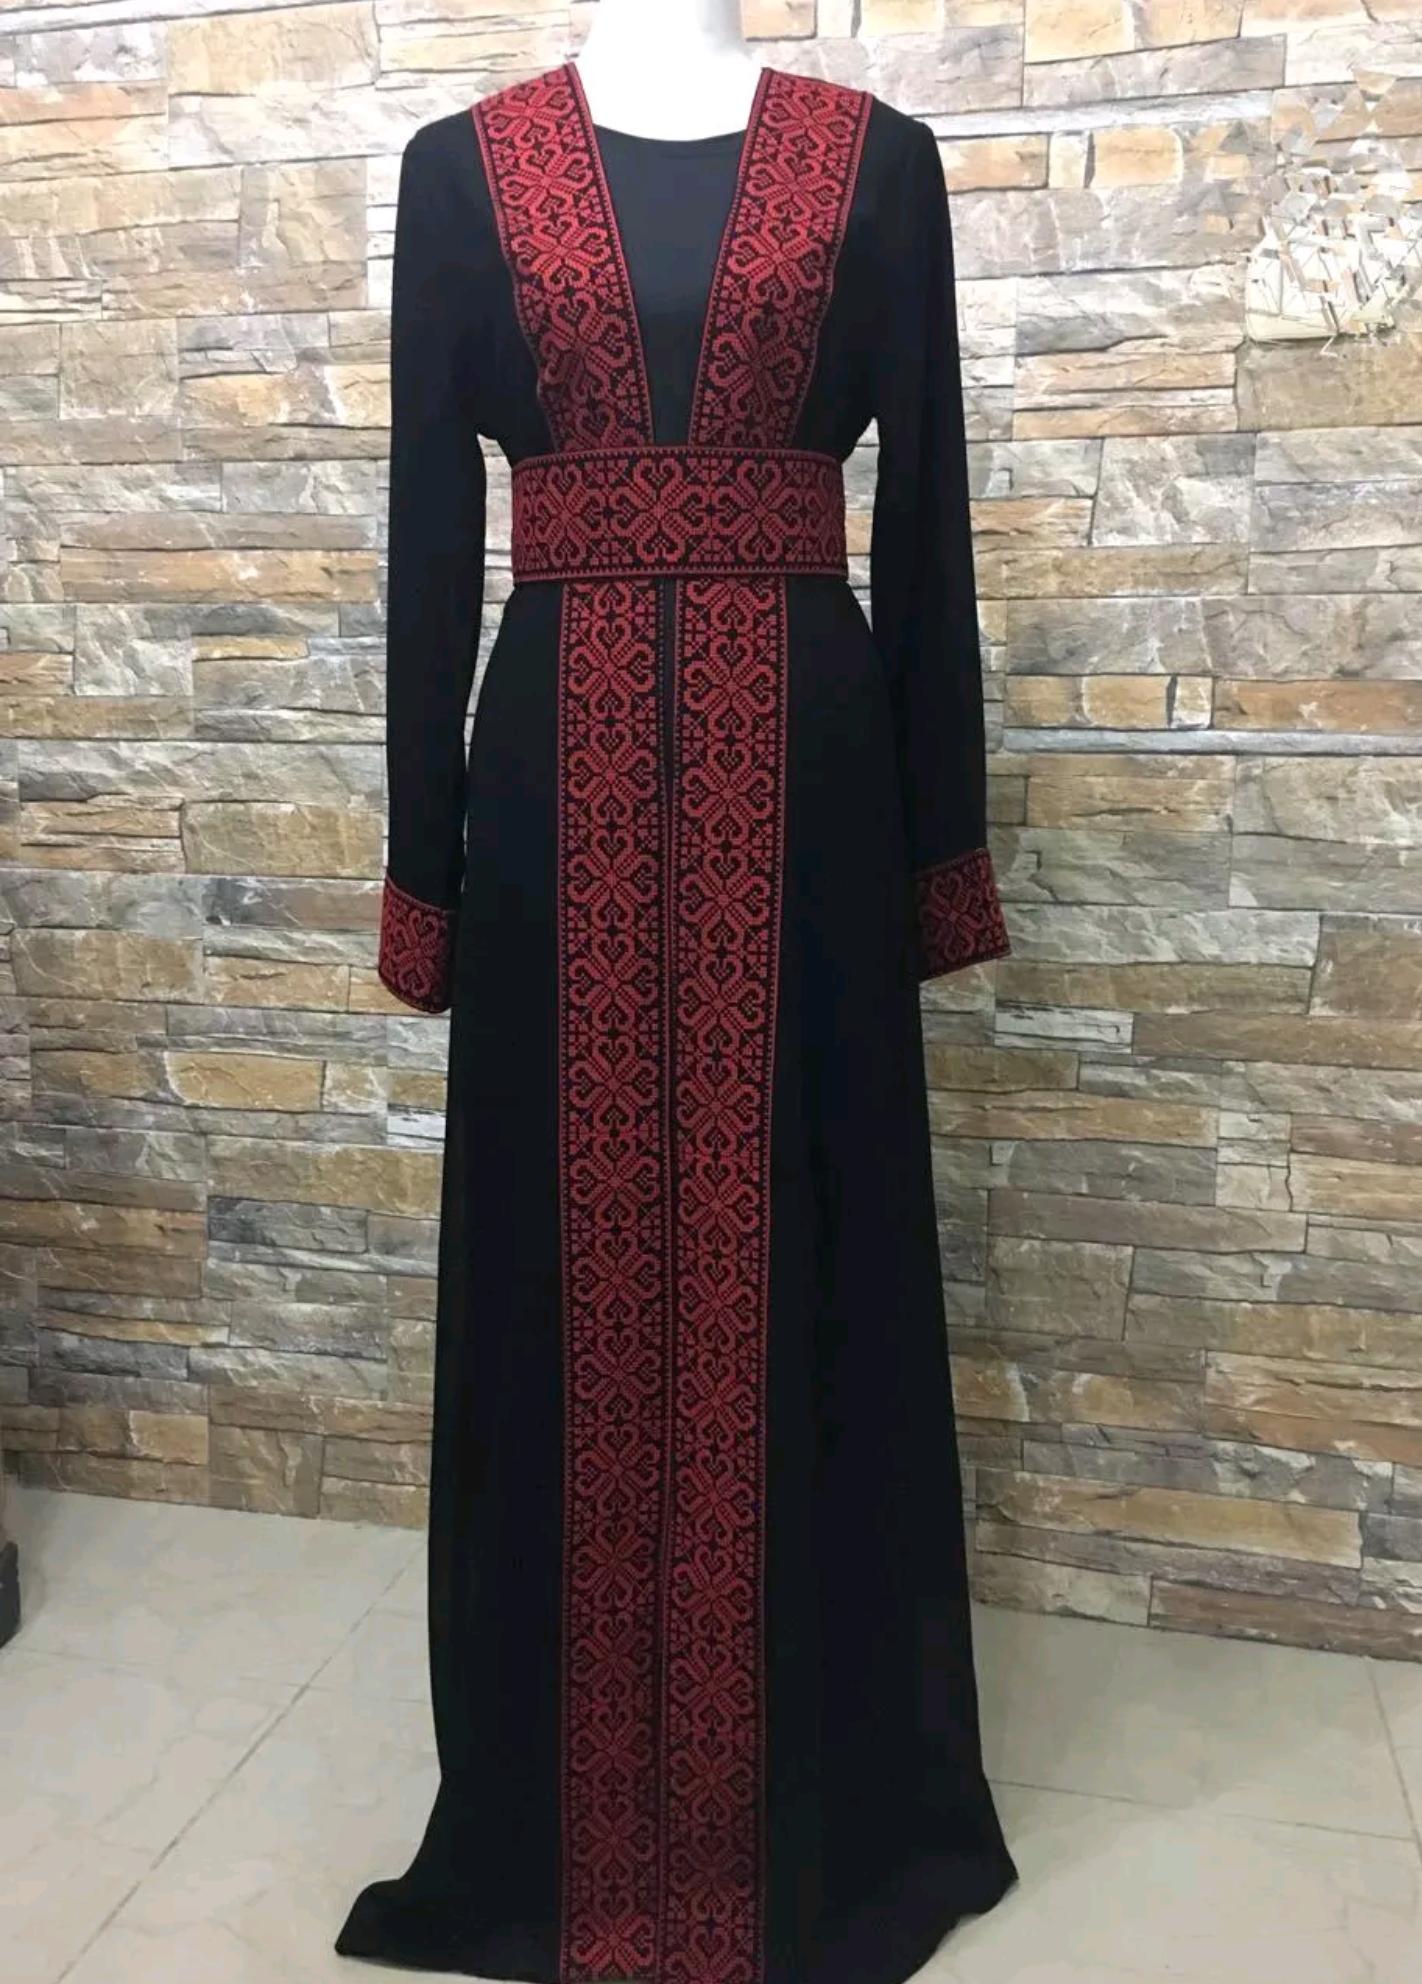 Palestinian Embroidered Thobe Abaya Traditional Islamic caftan Dress